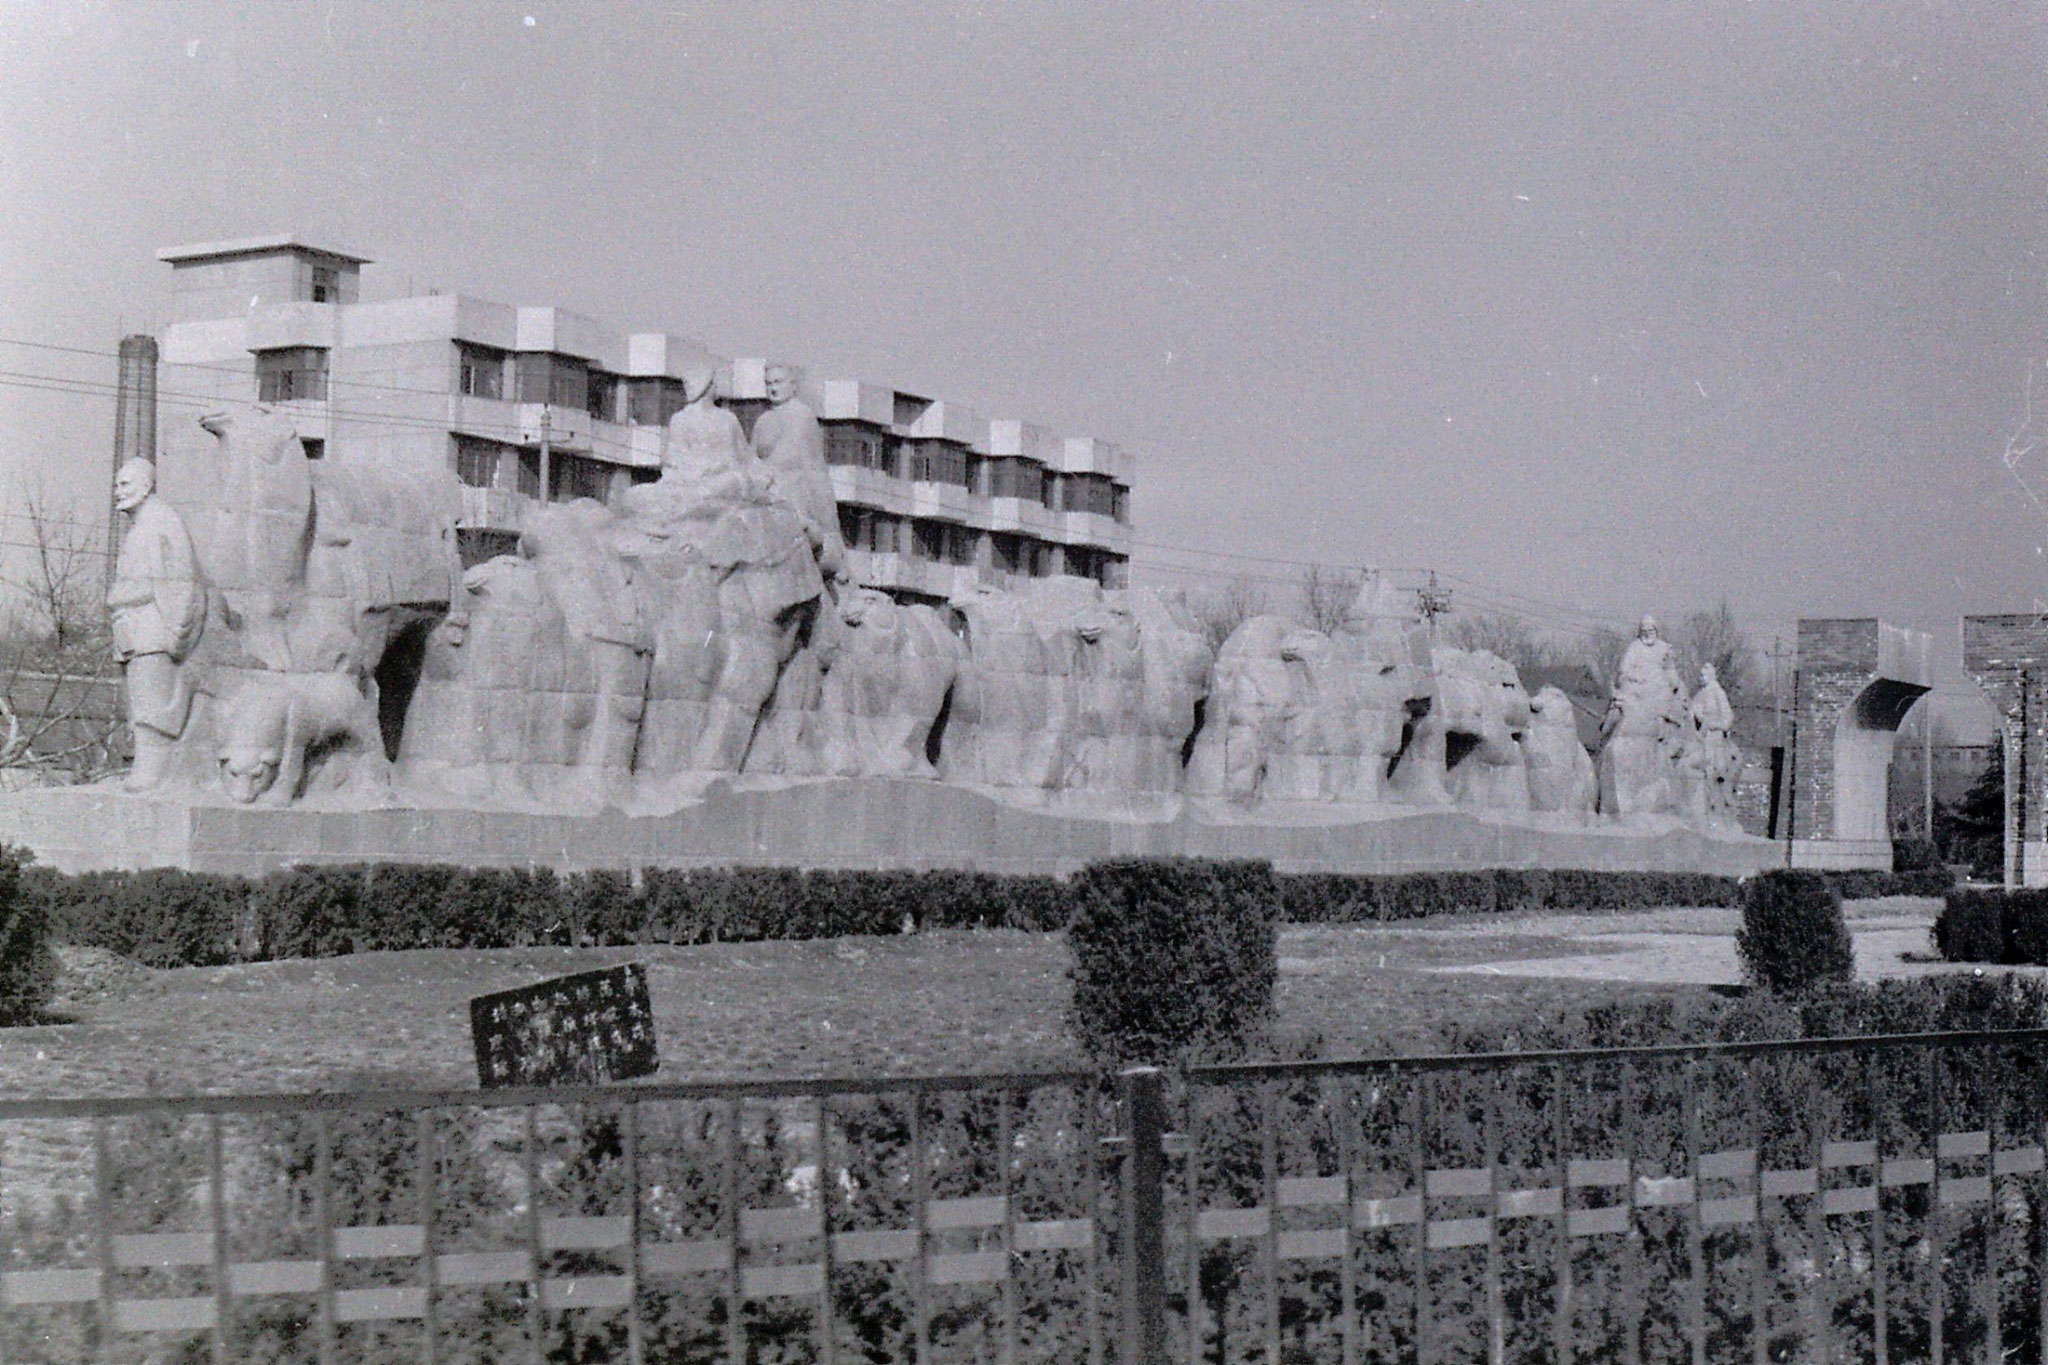 7/3/1989: 24: Xianyang silk road statues